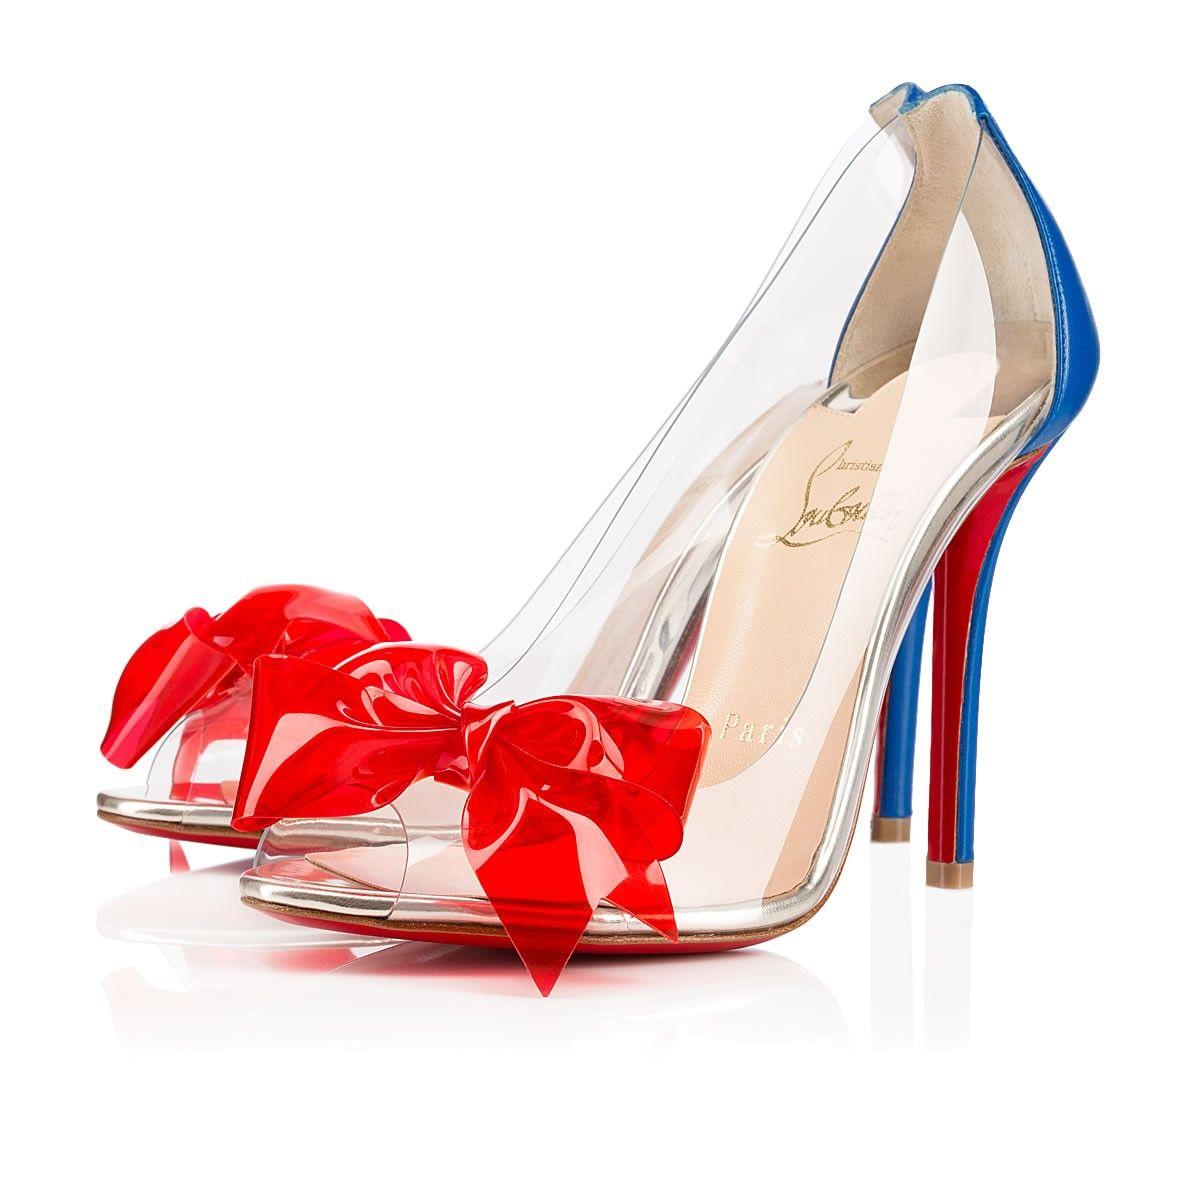 fd31e47d1ec1 karrueche tran wearing pink lou boutins shoes louboutin wedding ...